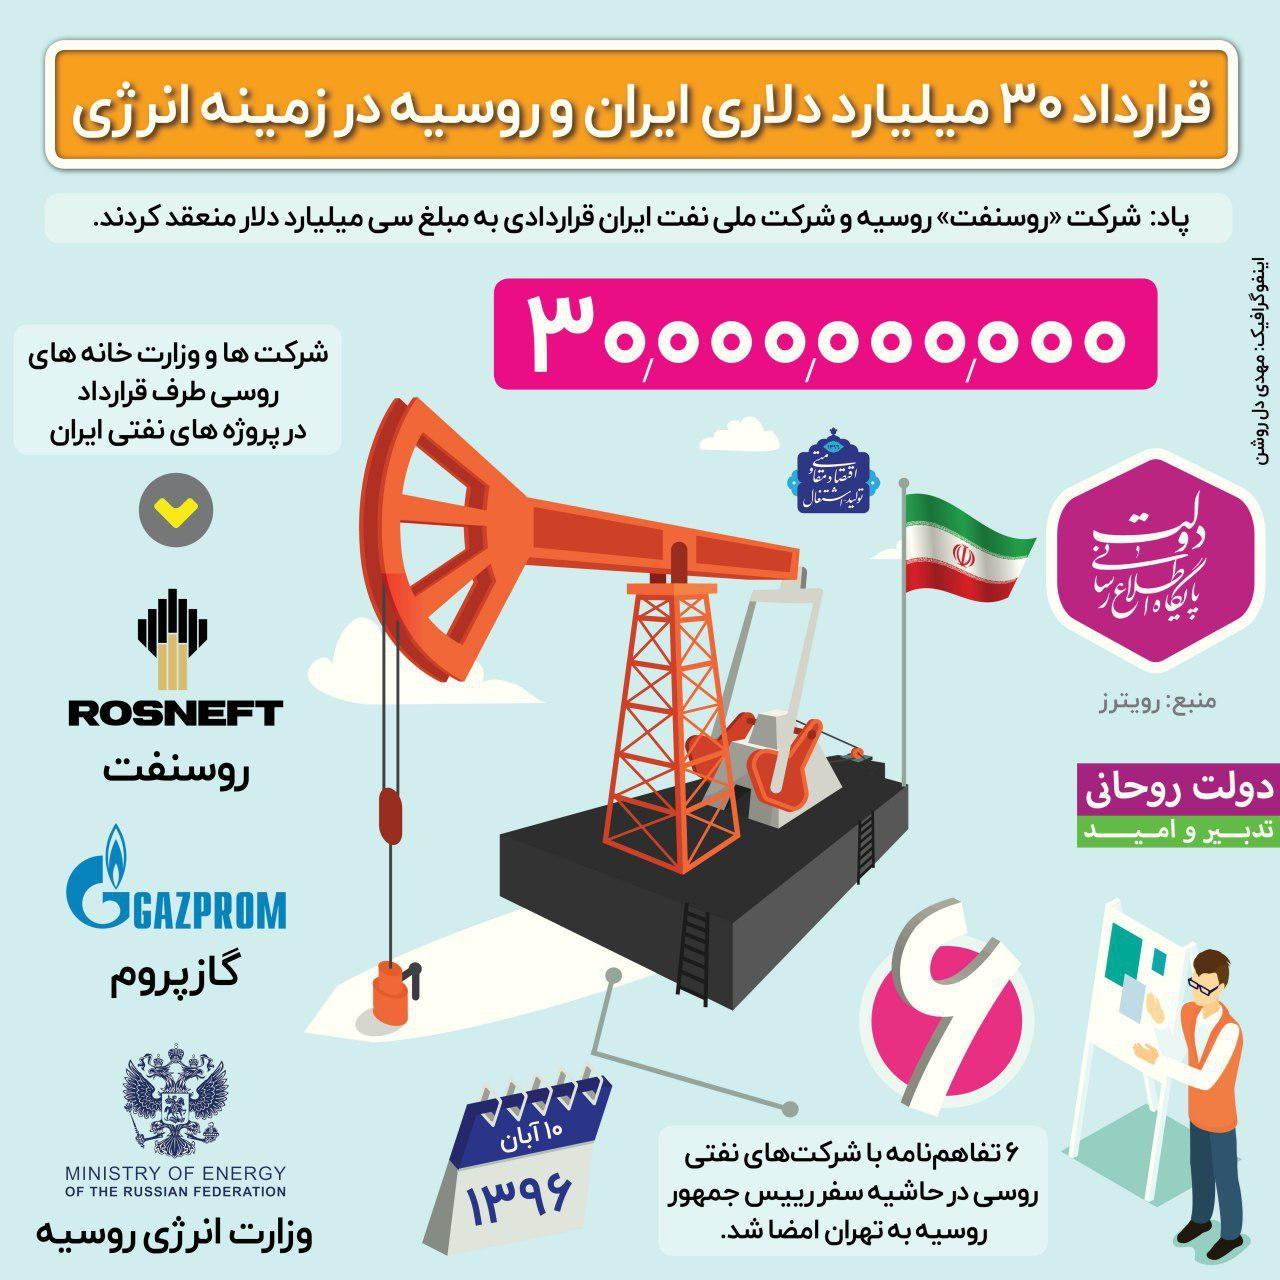 17-11-2-154735photo_2017-11-02_15-46-20 قرارداد 30 میلیارد دلاری ایران و روسیه در زمینه انرژی